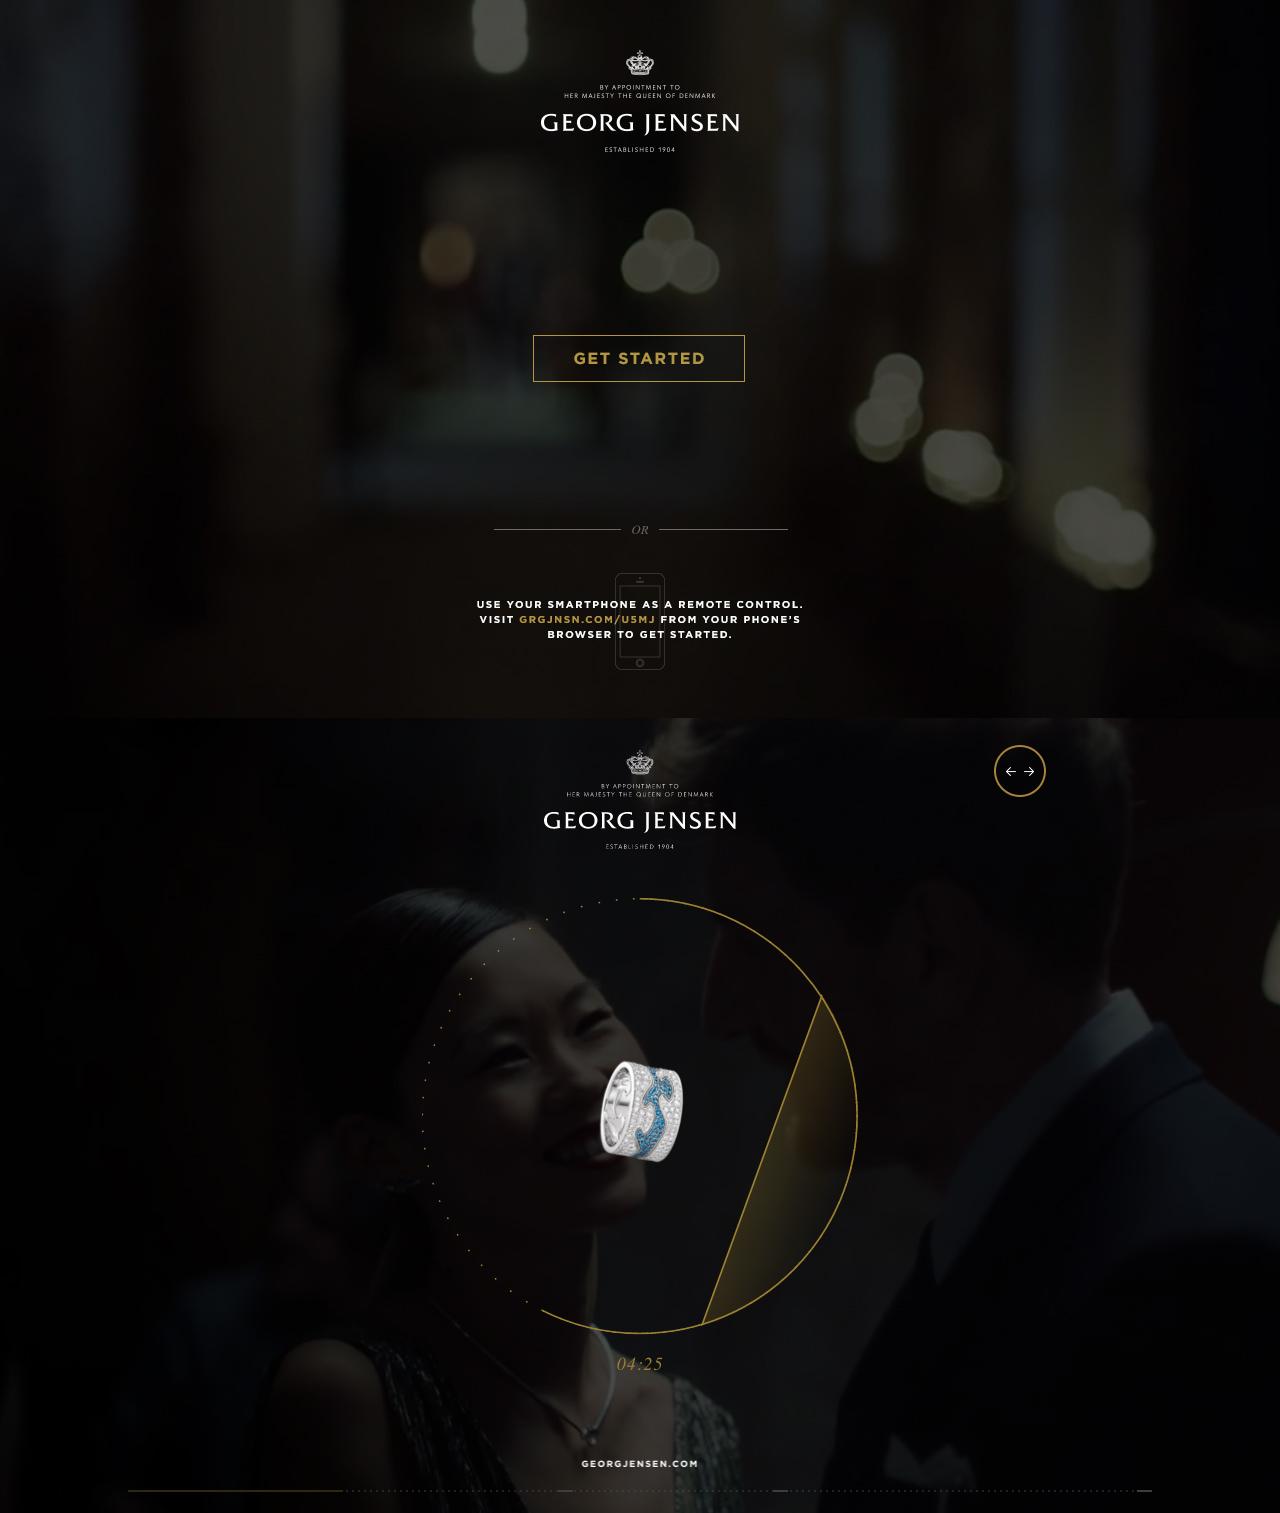 The Gift Of Giving Website Screenshot